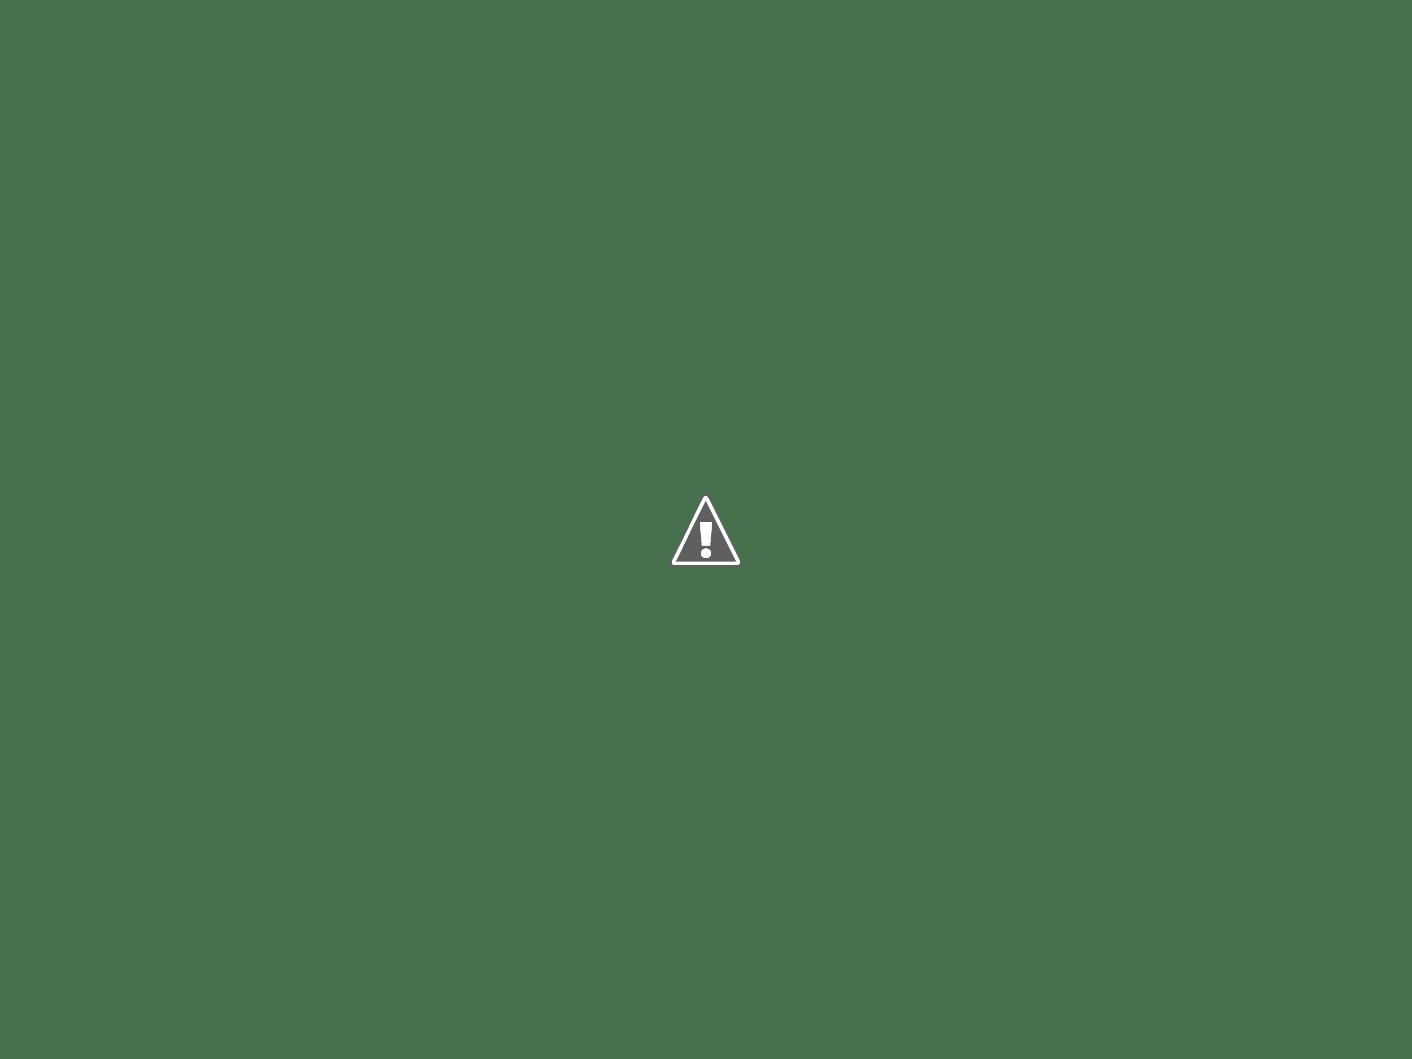 Tanakajd - Magyarok Nagyasszonya rk. templom